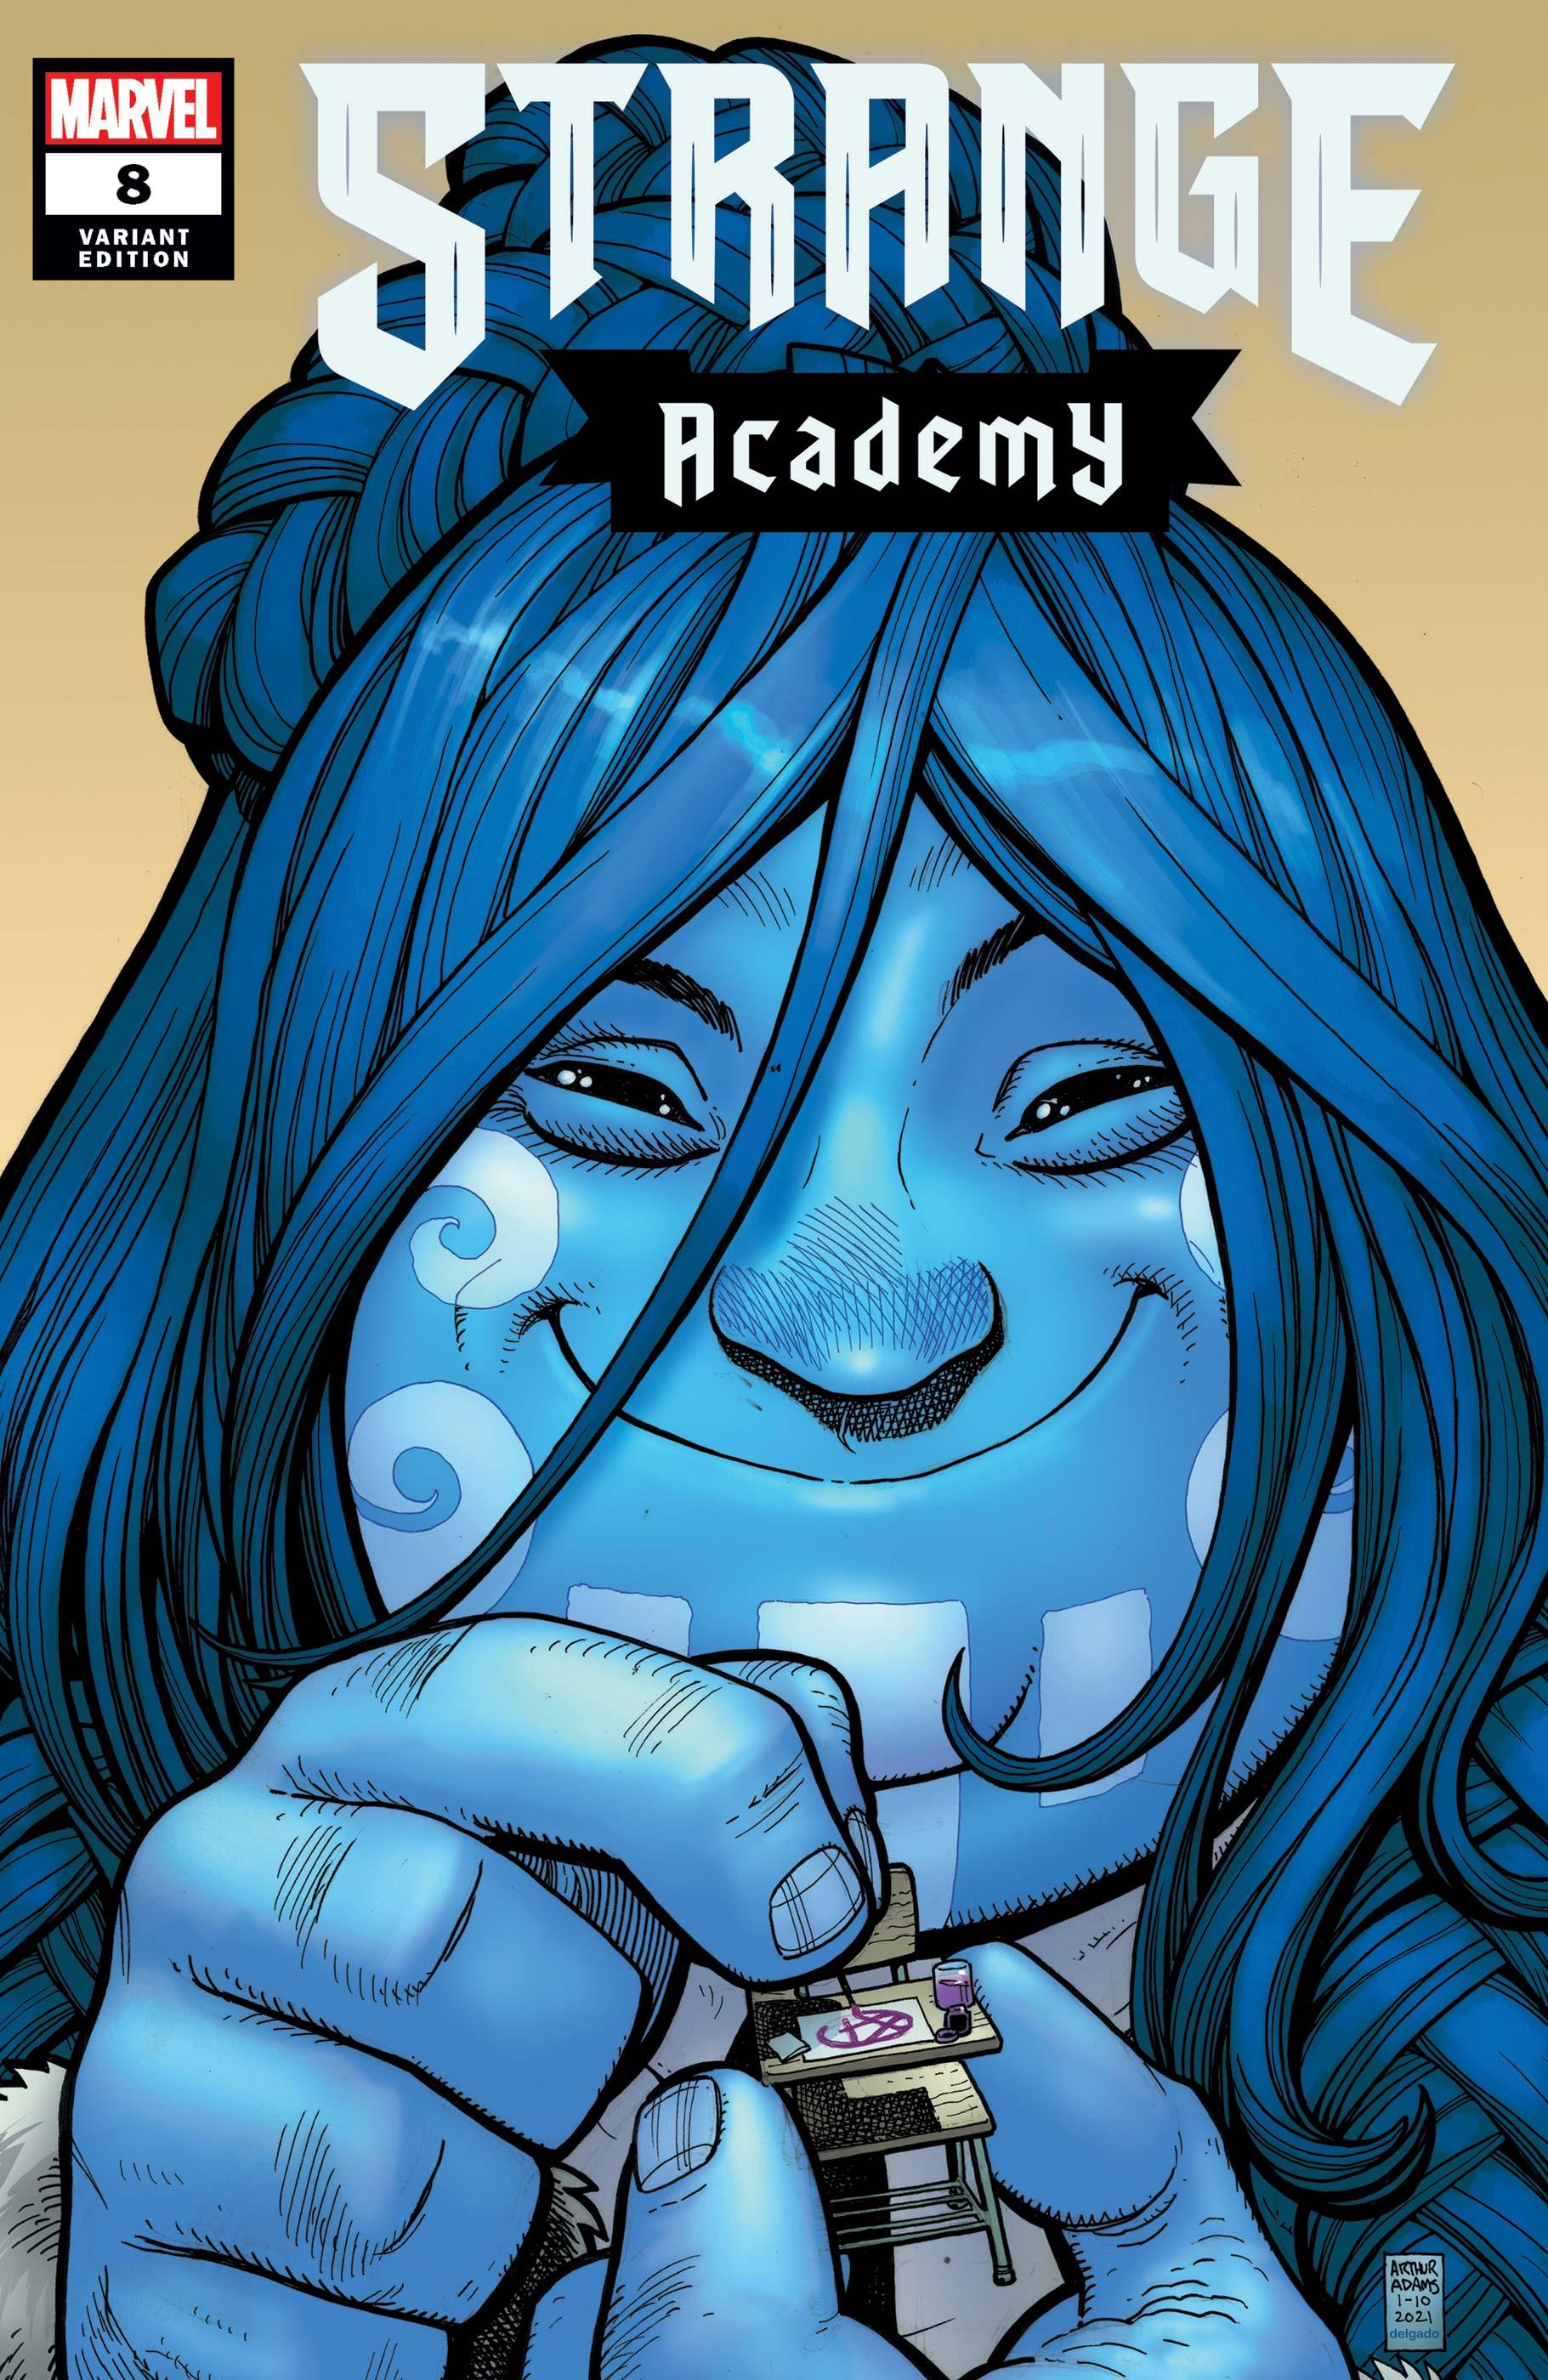 Strange Academy (2020) #8 (Variant)